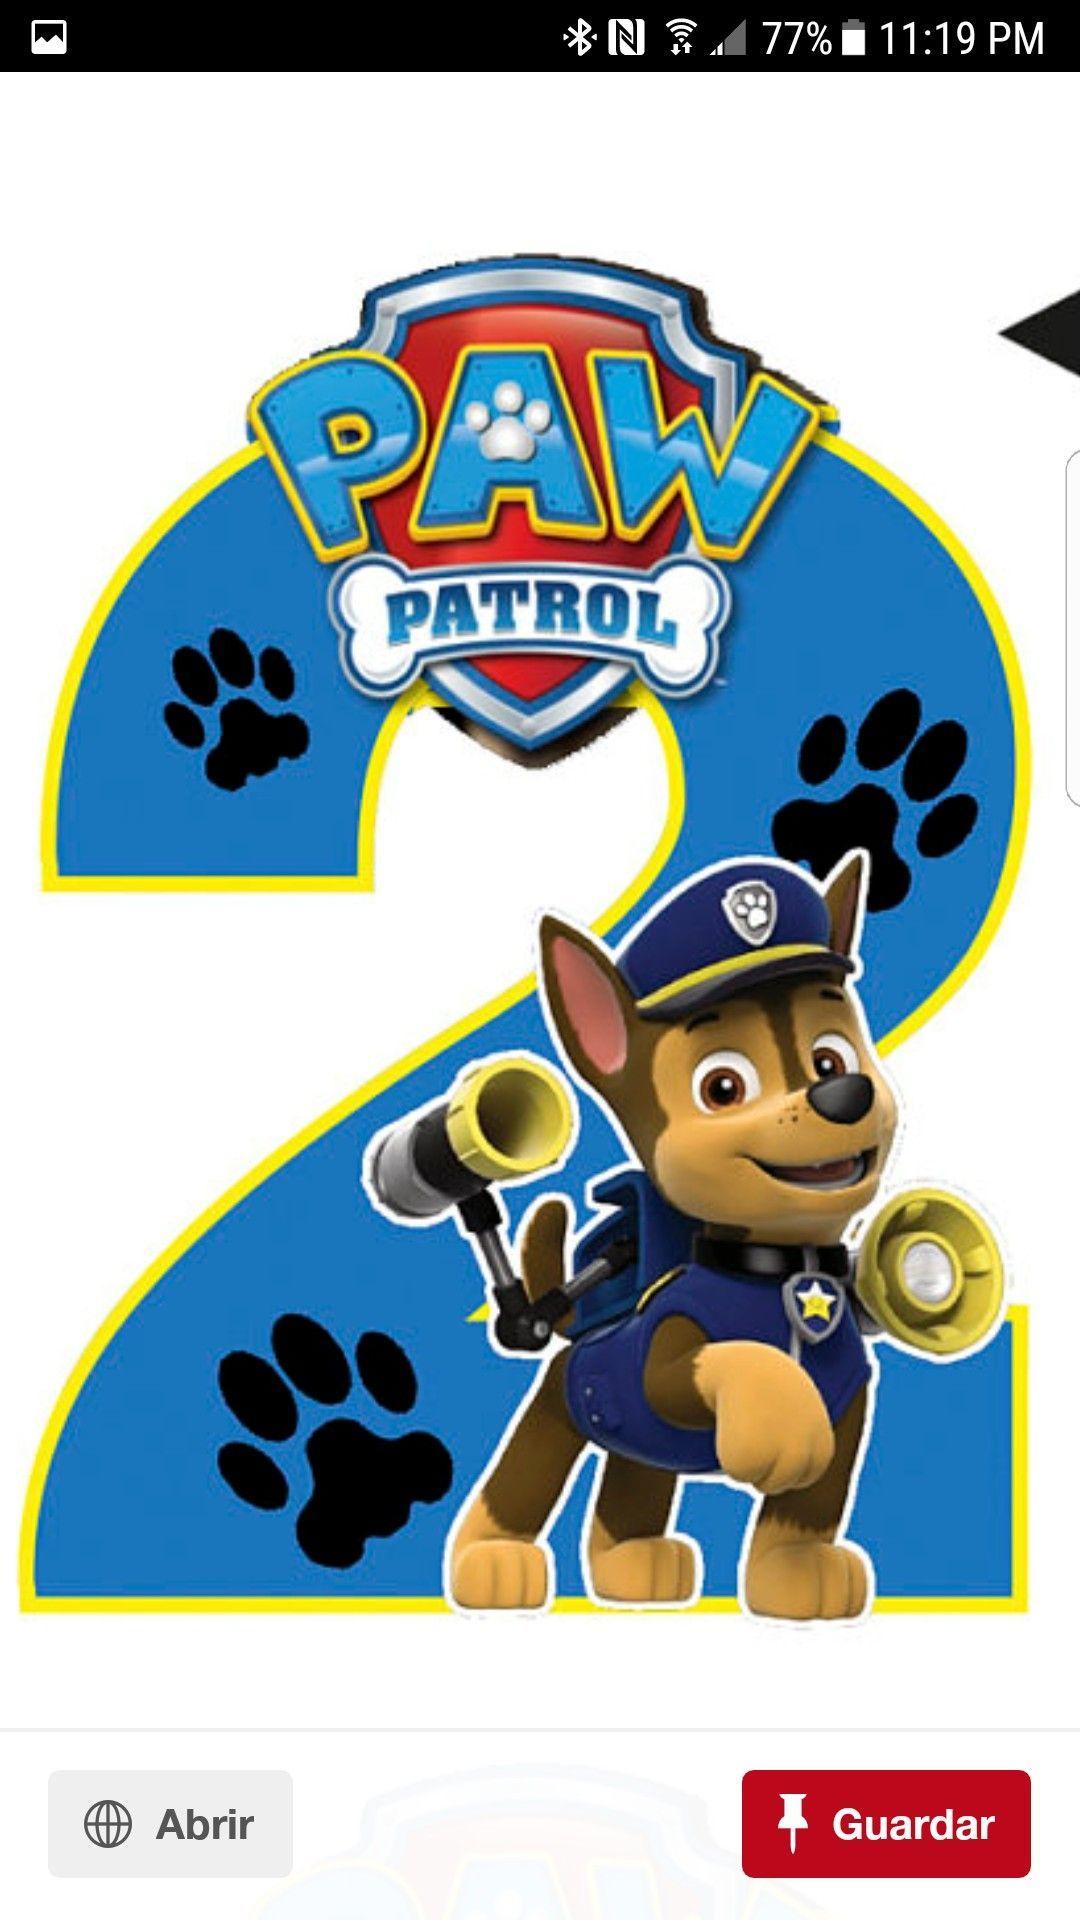 Paw Patrol Chase Wallpaper Paw Patrol Birthday Paw Patrol Party Paw Patrol Decorations